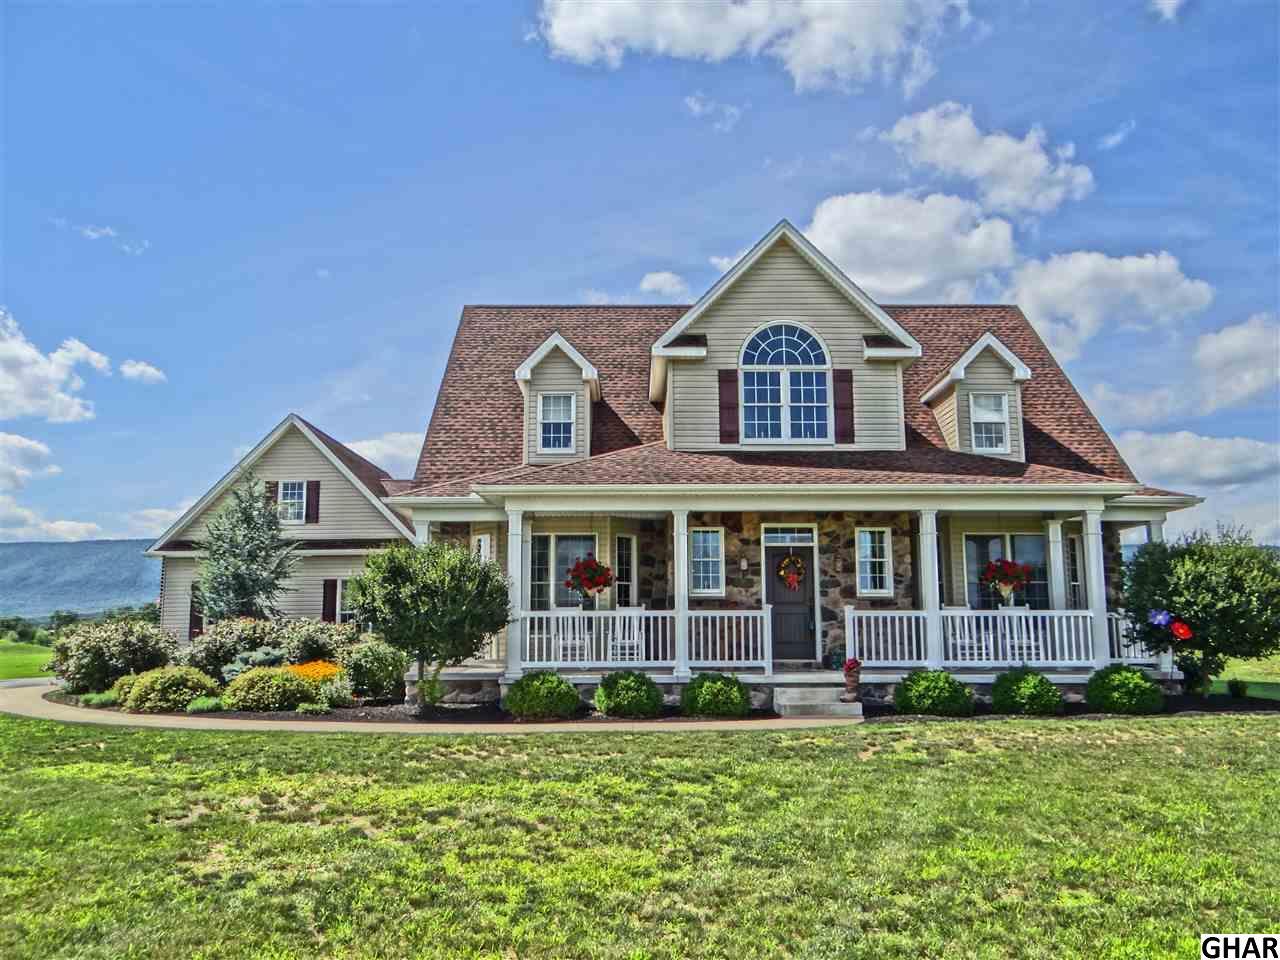 Real Estate for Sale, ListingId: 32594590, Newville,PA17241